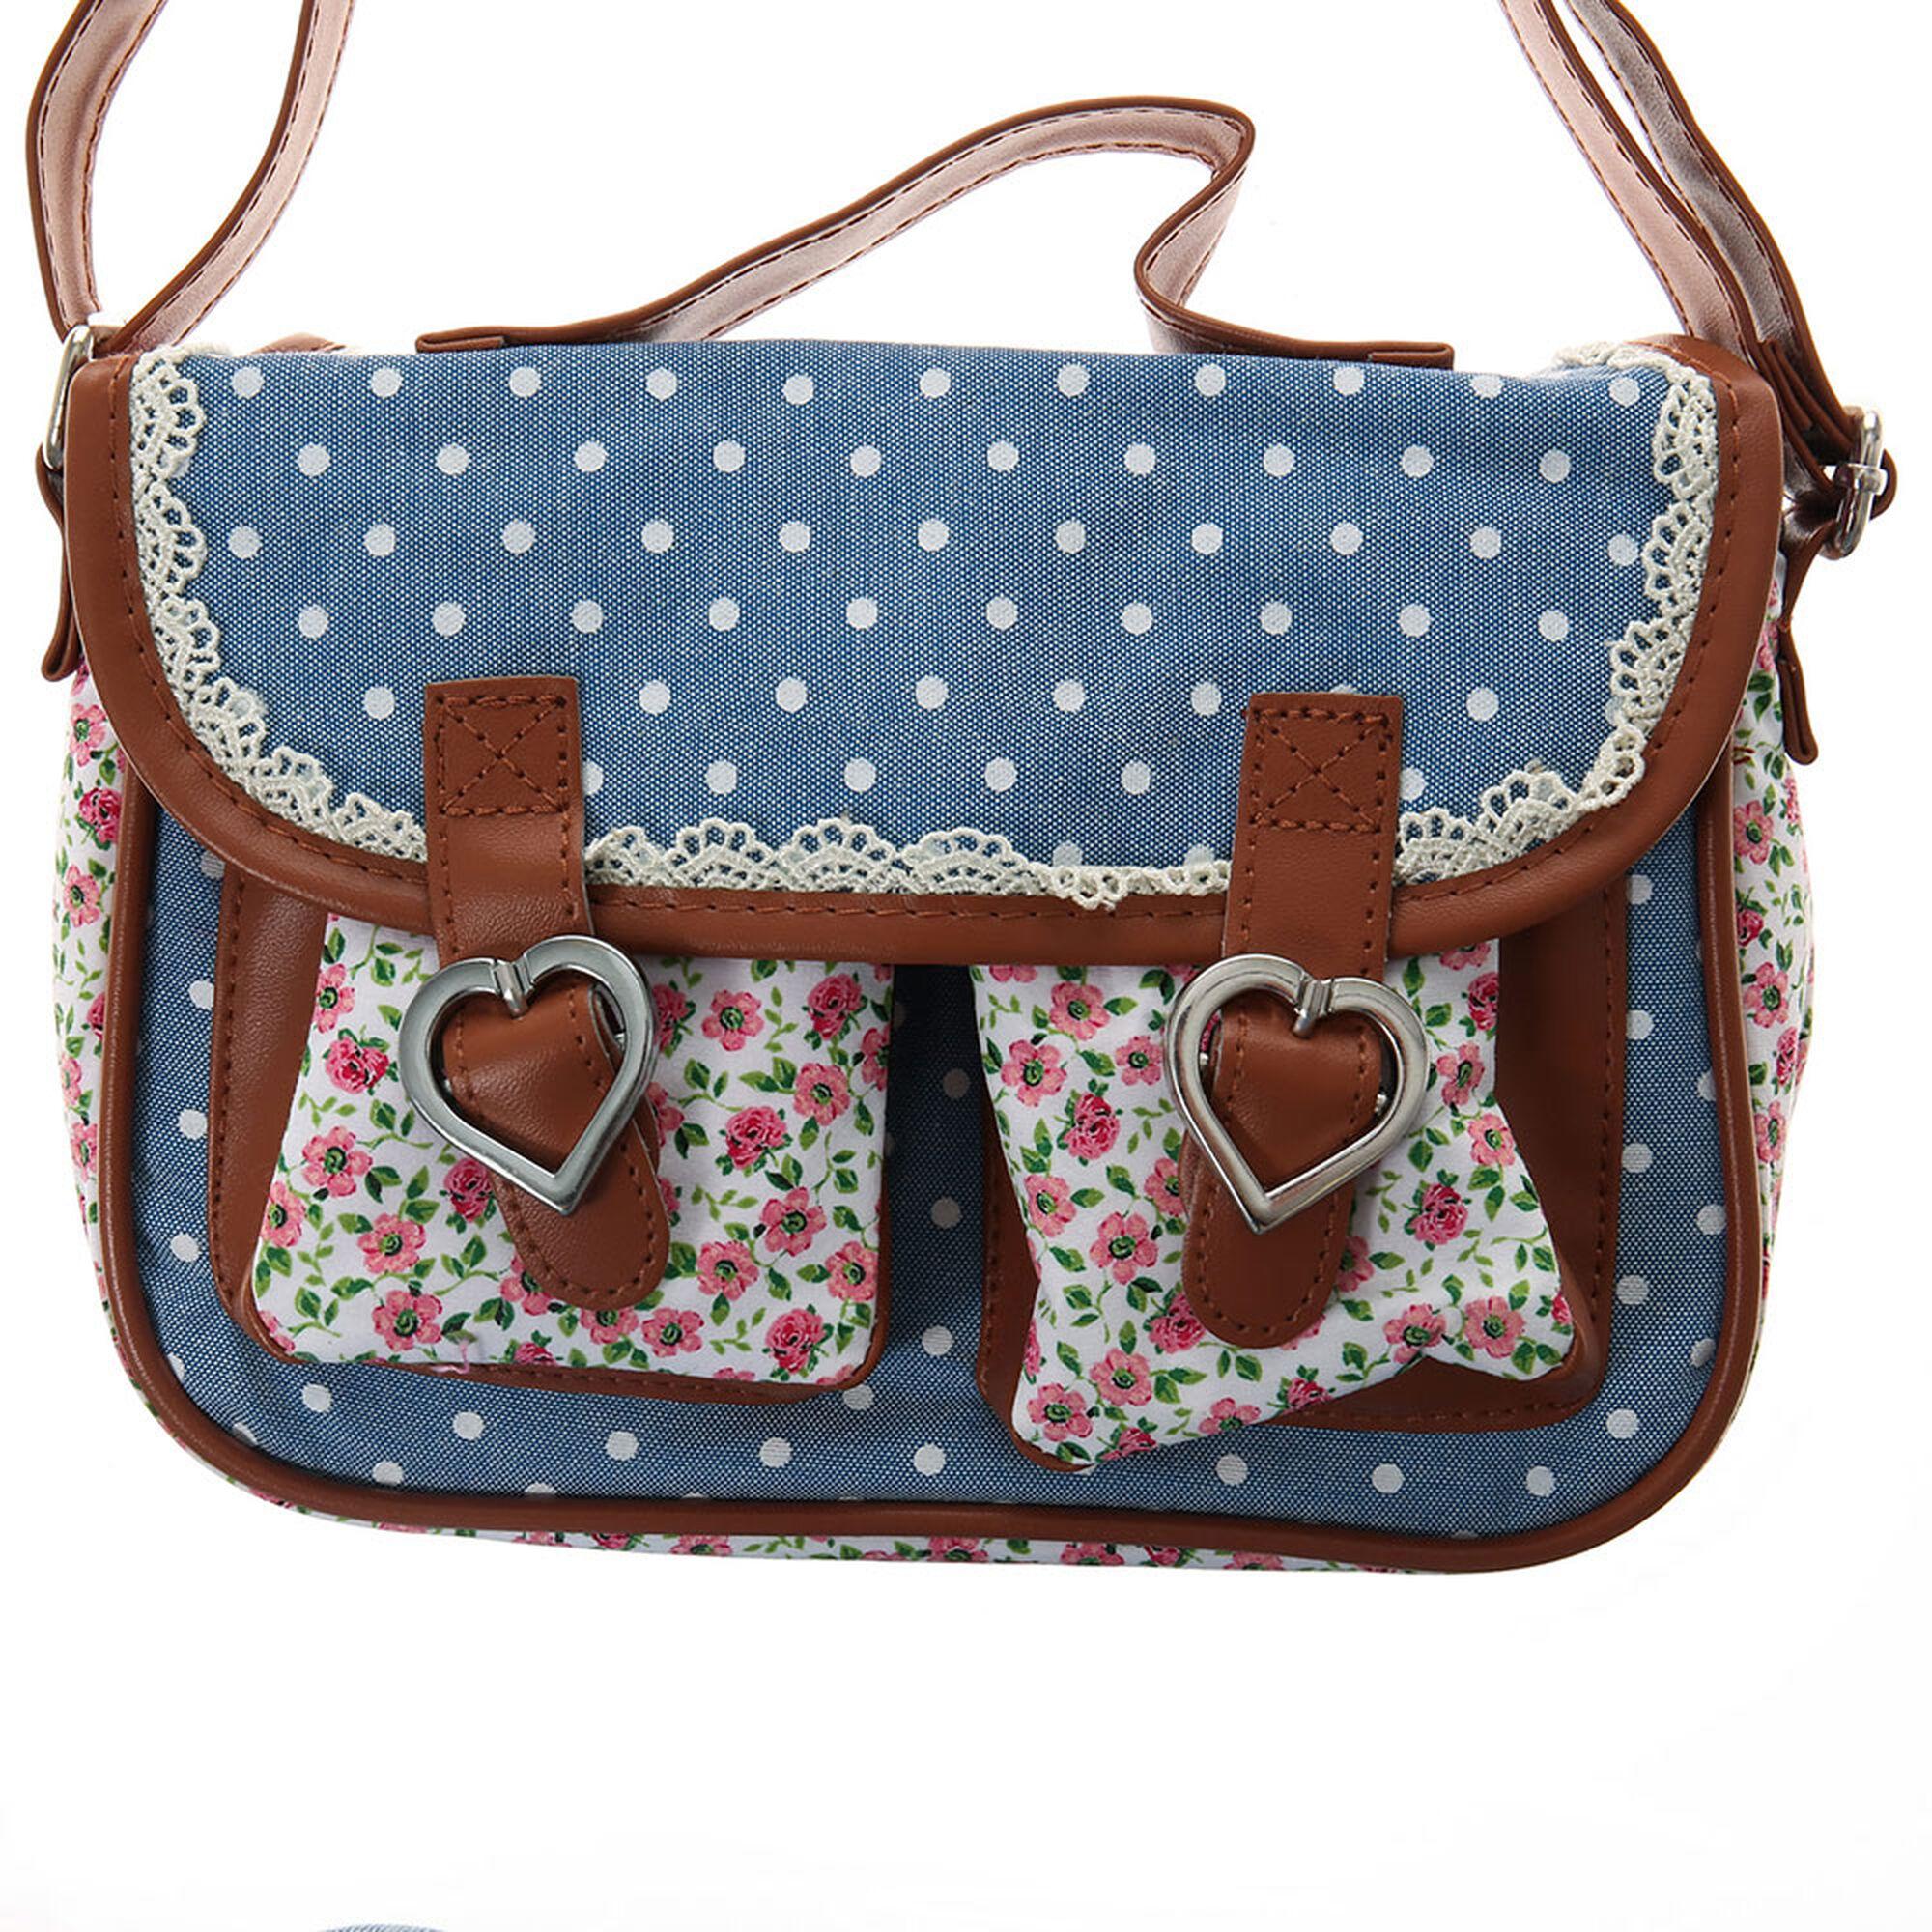 Kids Floral And Polka Dot Blue Crossbody Bag | Claireu0026#39;s